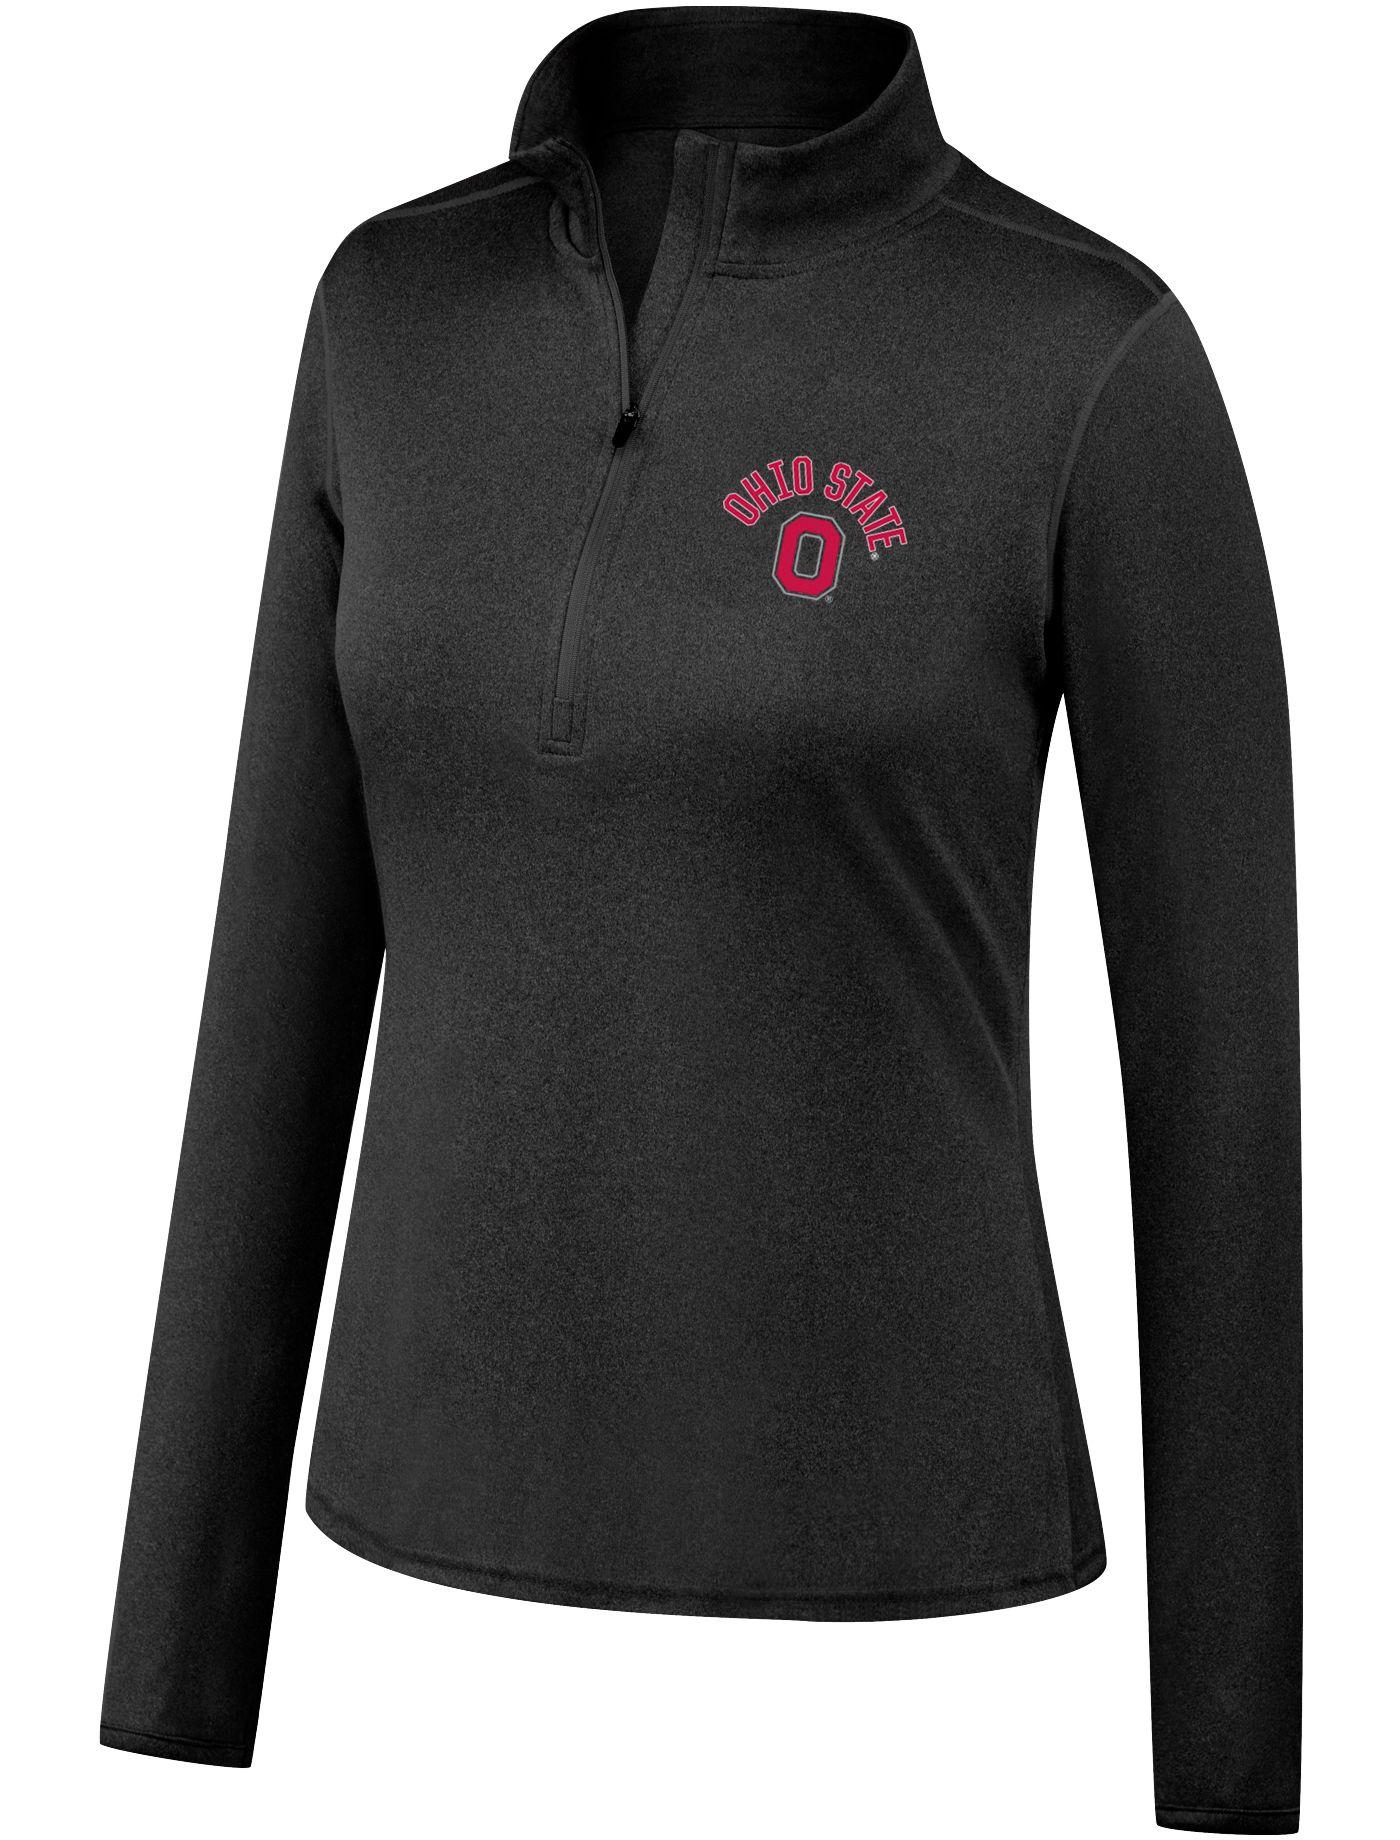 Scarlet & Gray Women's Ohio State Buckeyes Quarter-Zip Black Shirt